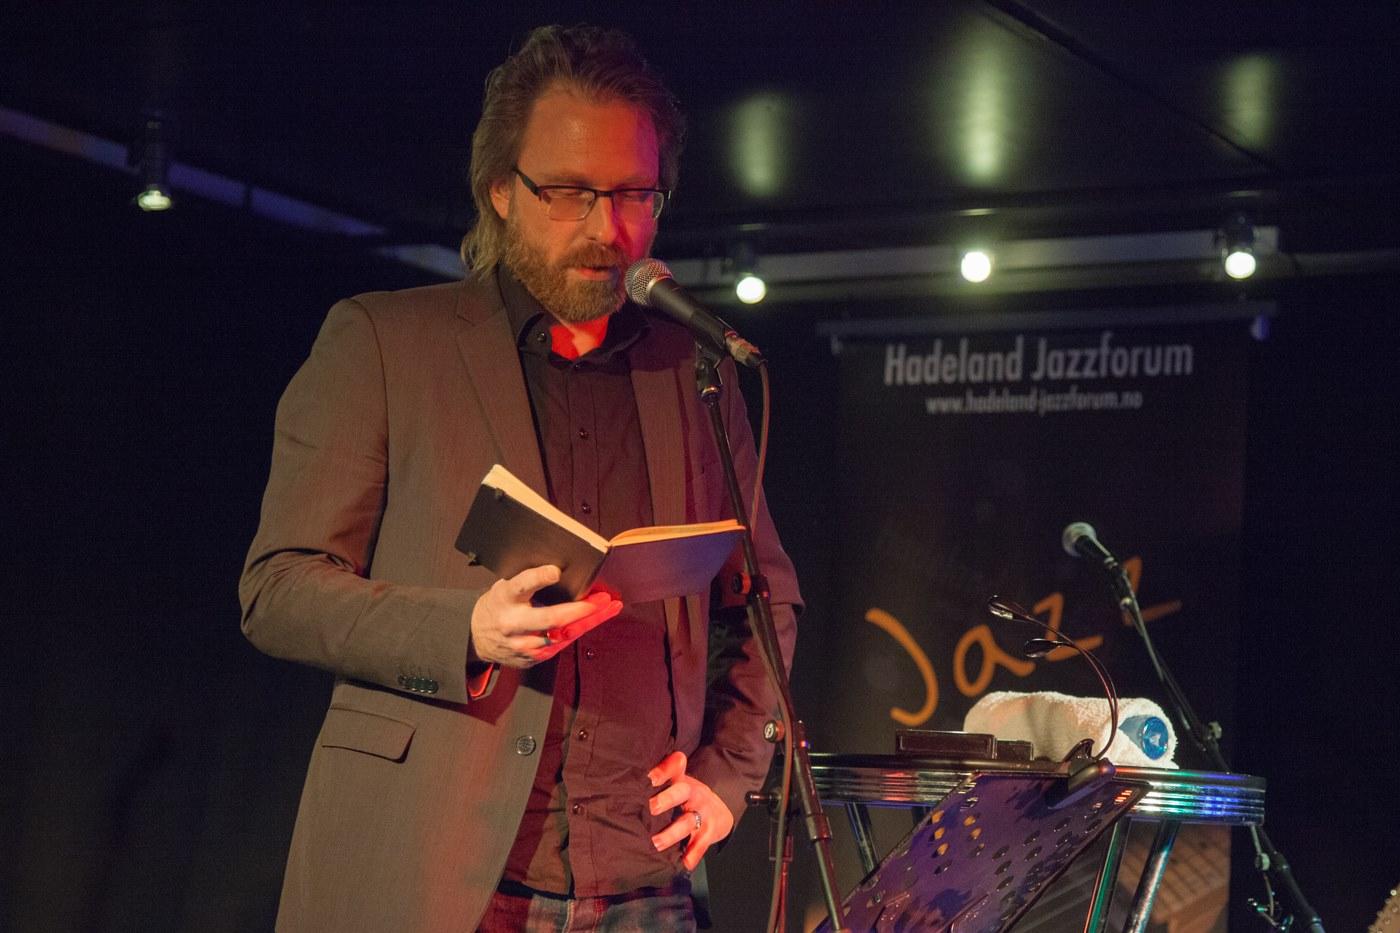 Leif Høghaug hadde lynforedrag om Håvard Rem.                                                                Foto: Terje Pettersen